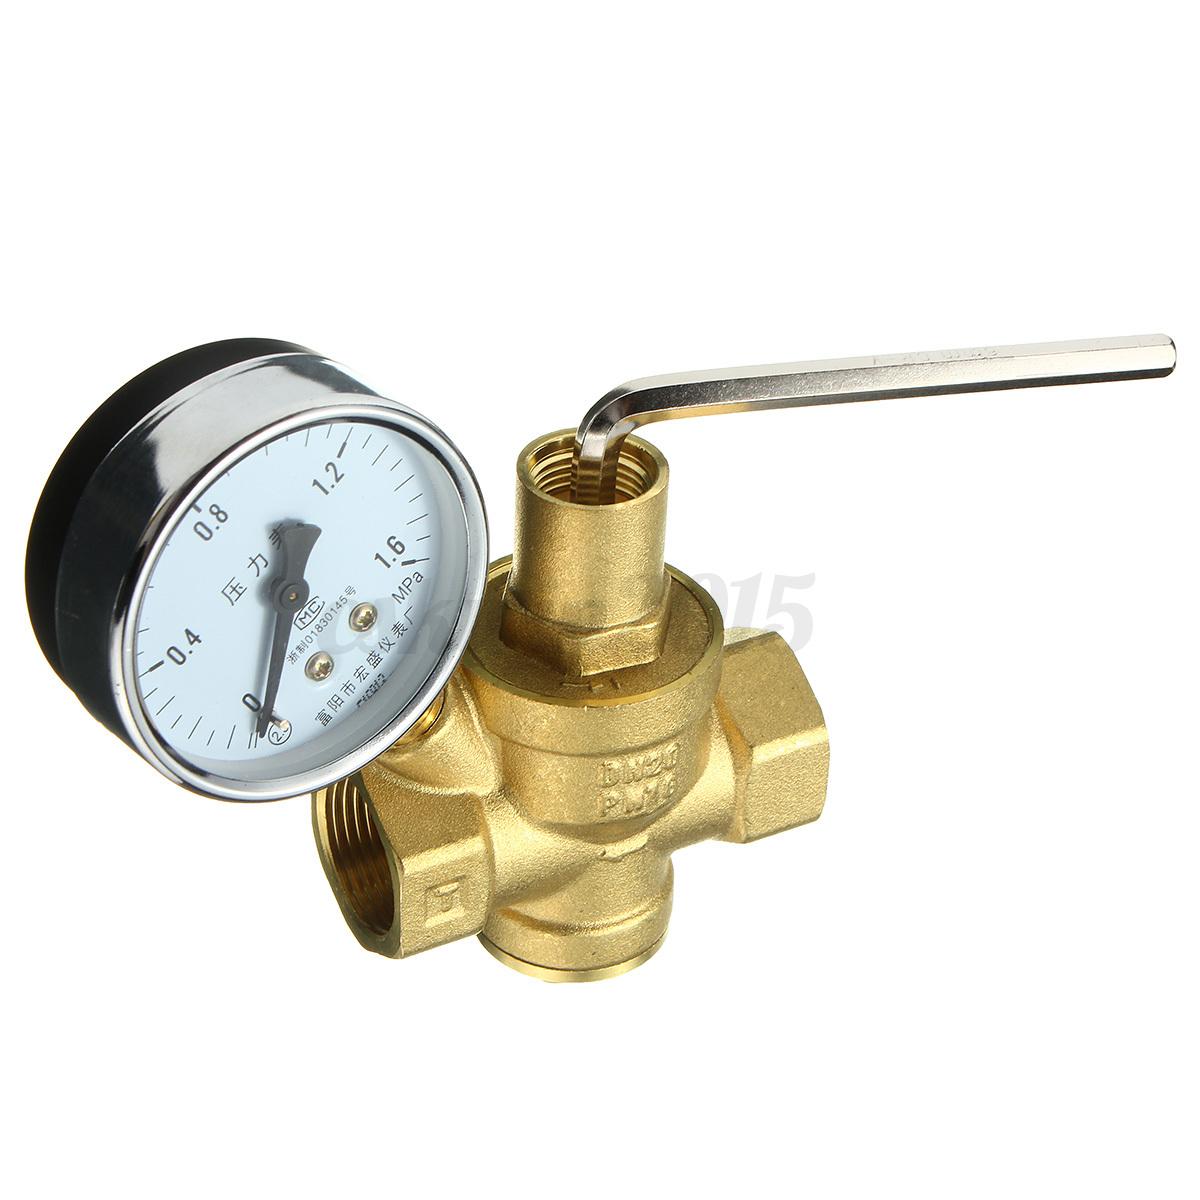 dn20 3 4 39 39 bspp brass water pressure reducing valve with adjustable gauge flow ebay. Black Bedroom Furniture Sets. Home Design Ideas